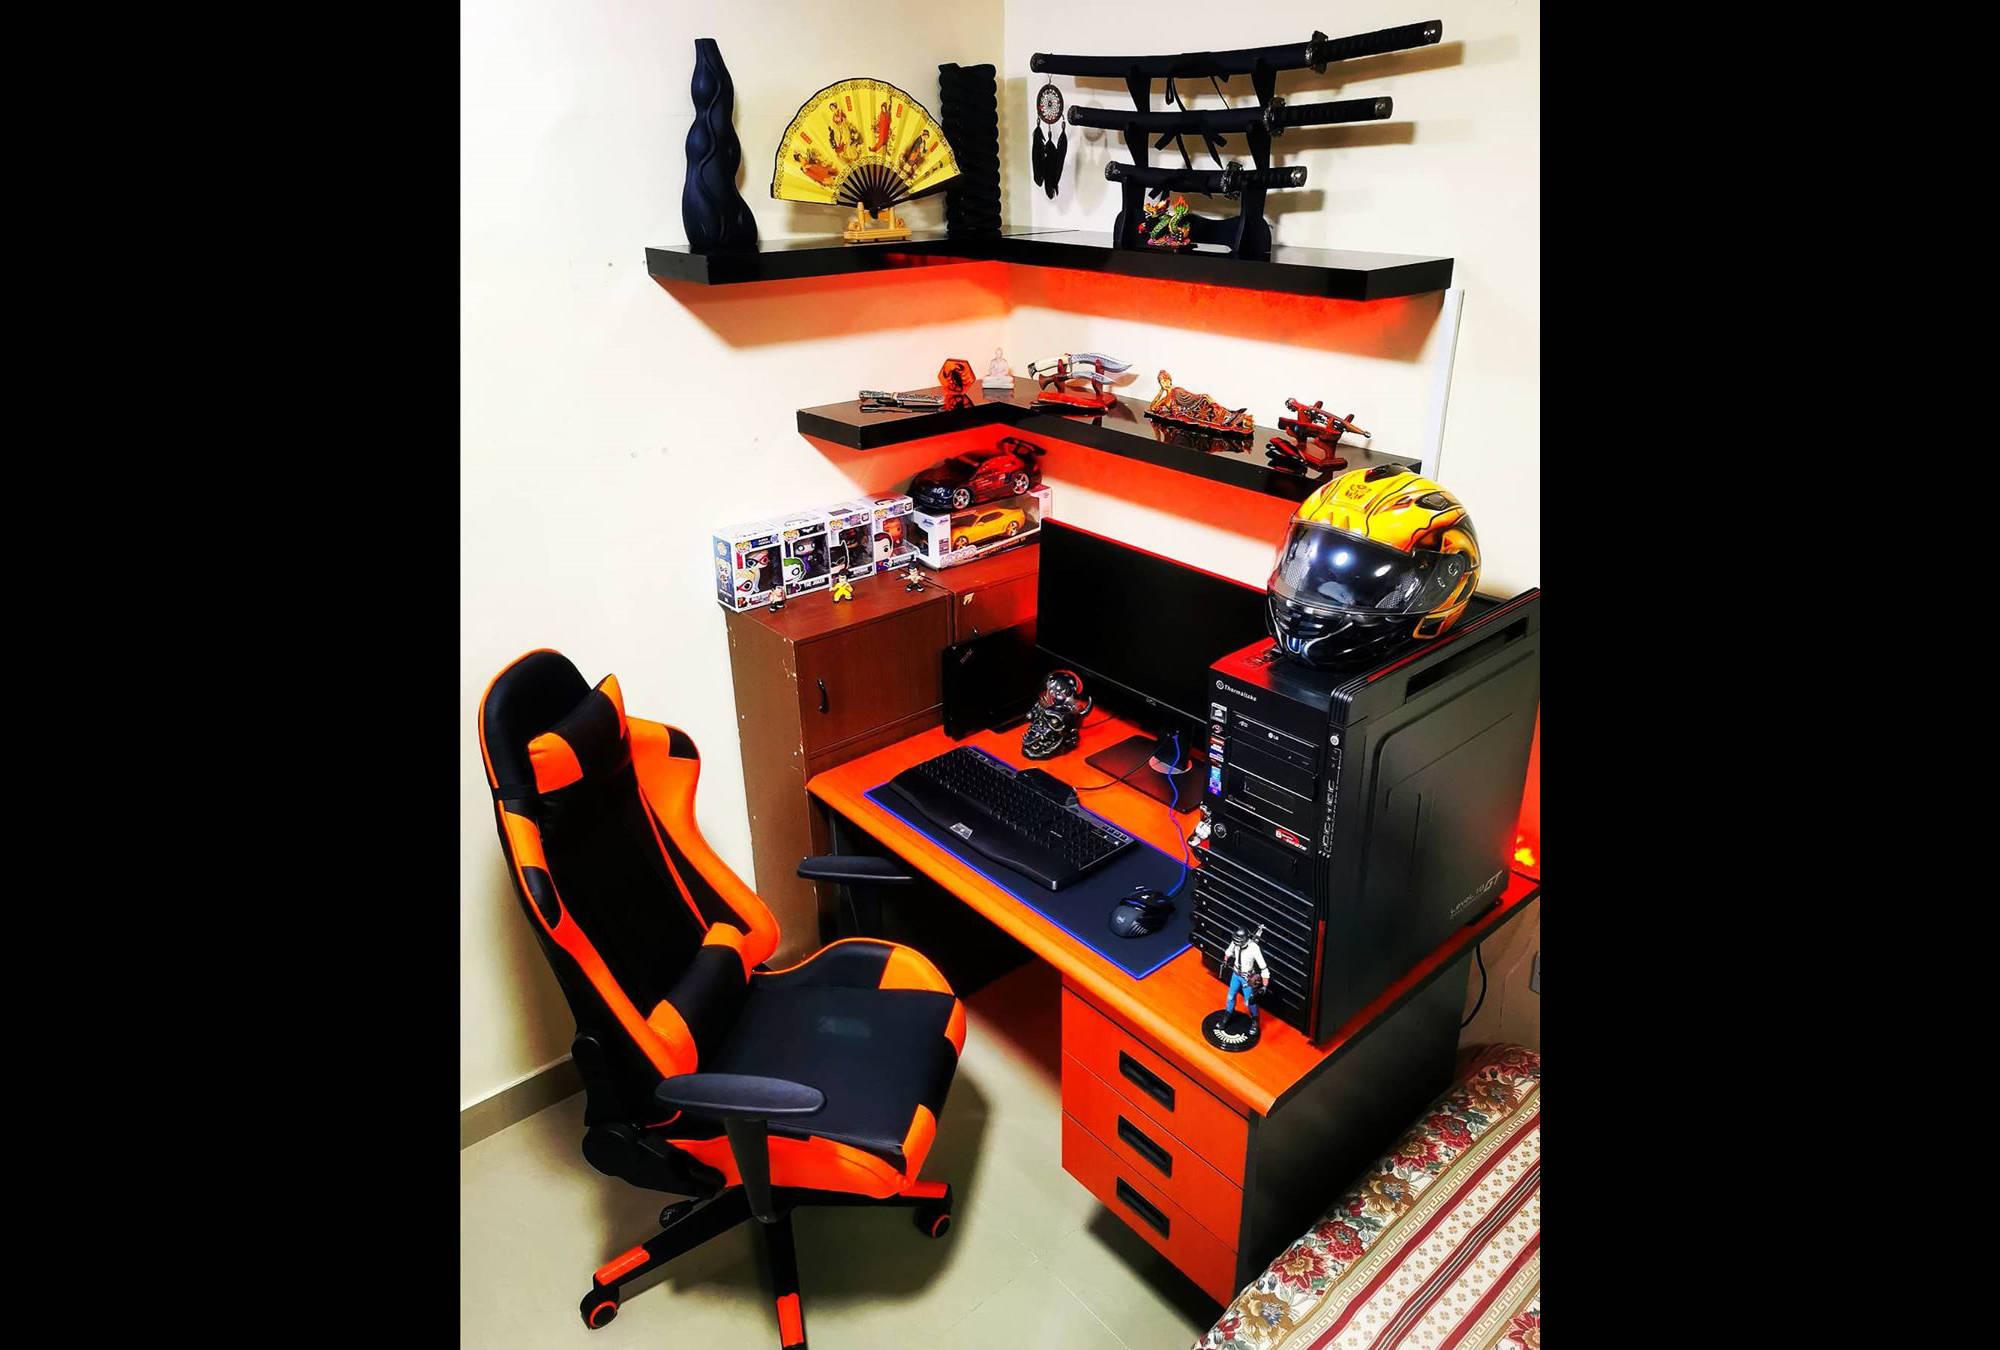 jayracutaspiras's Setup - Vintage minimal Workspace/Gaming Setup   Scooget